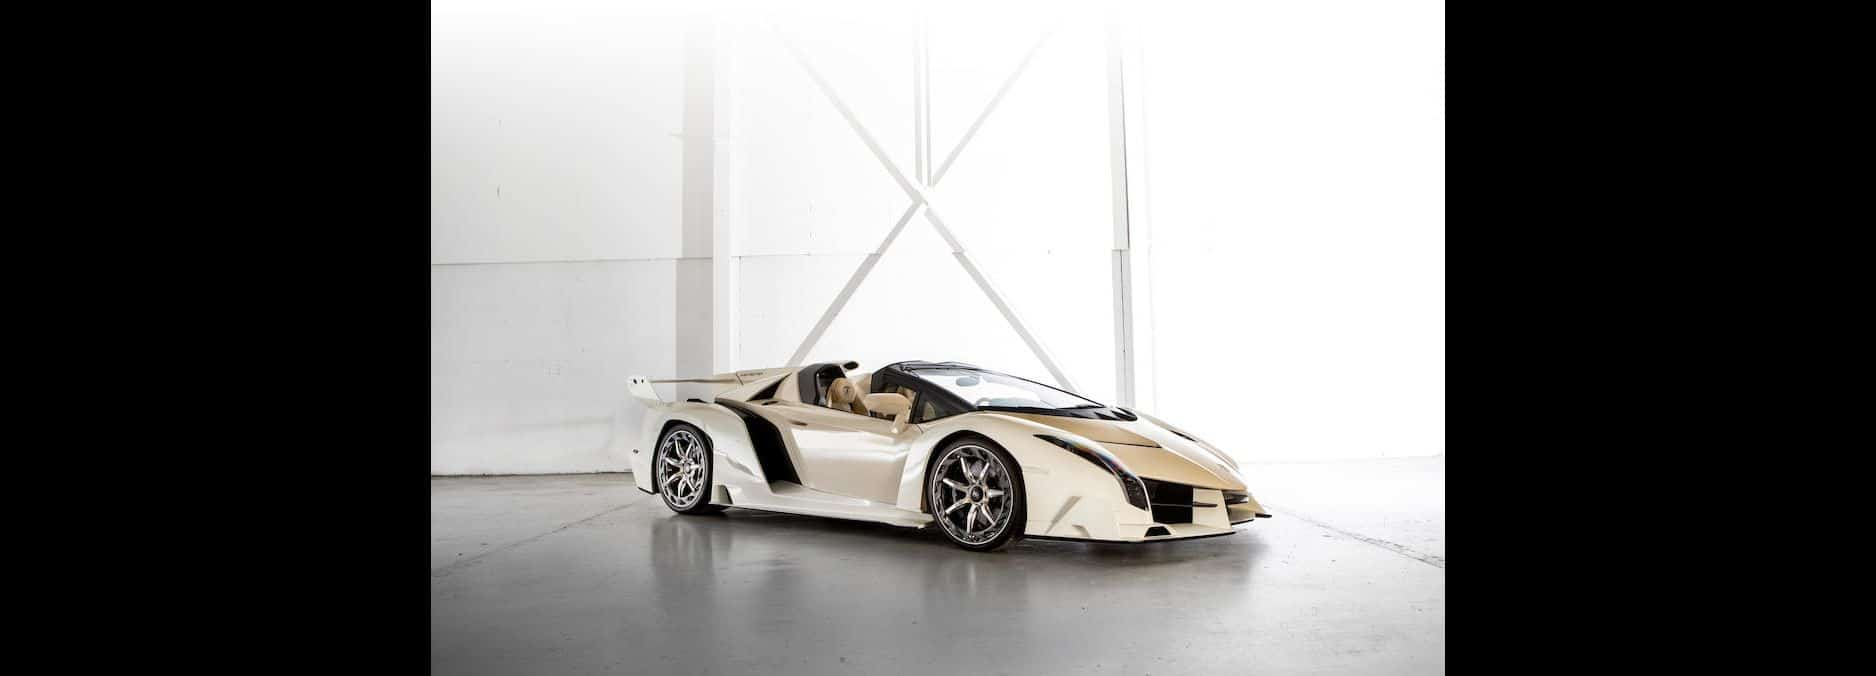 White-Lamborghini-Veneno-Roadster-3